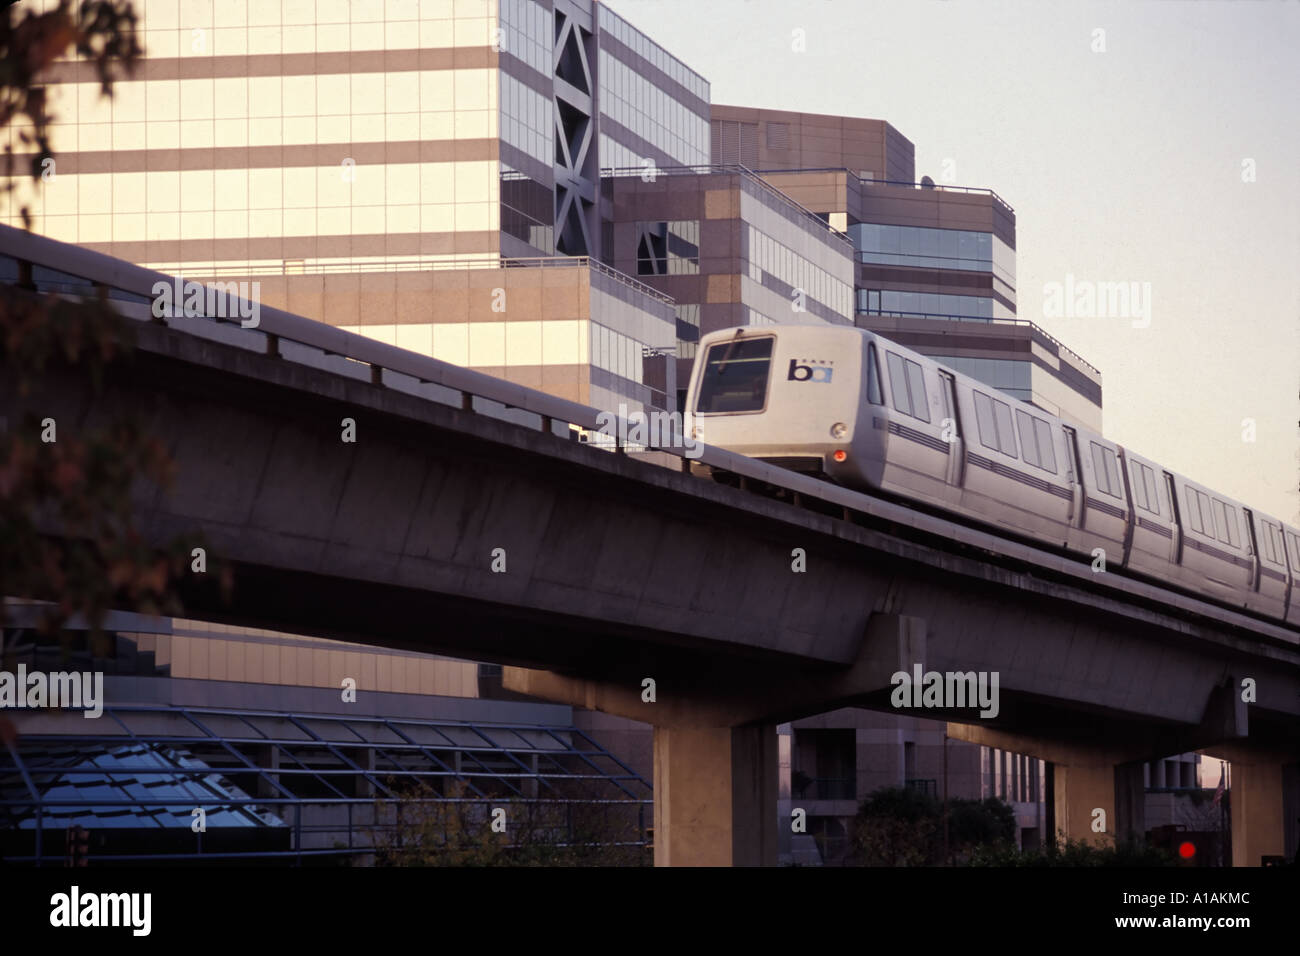 California, Contra Costa, BART train near Walnut Creek station - Stock Image